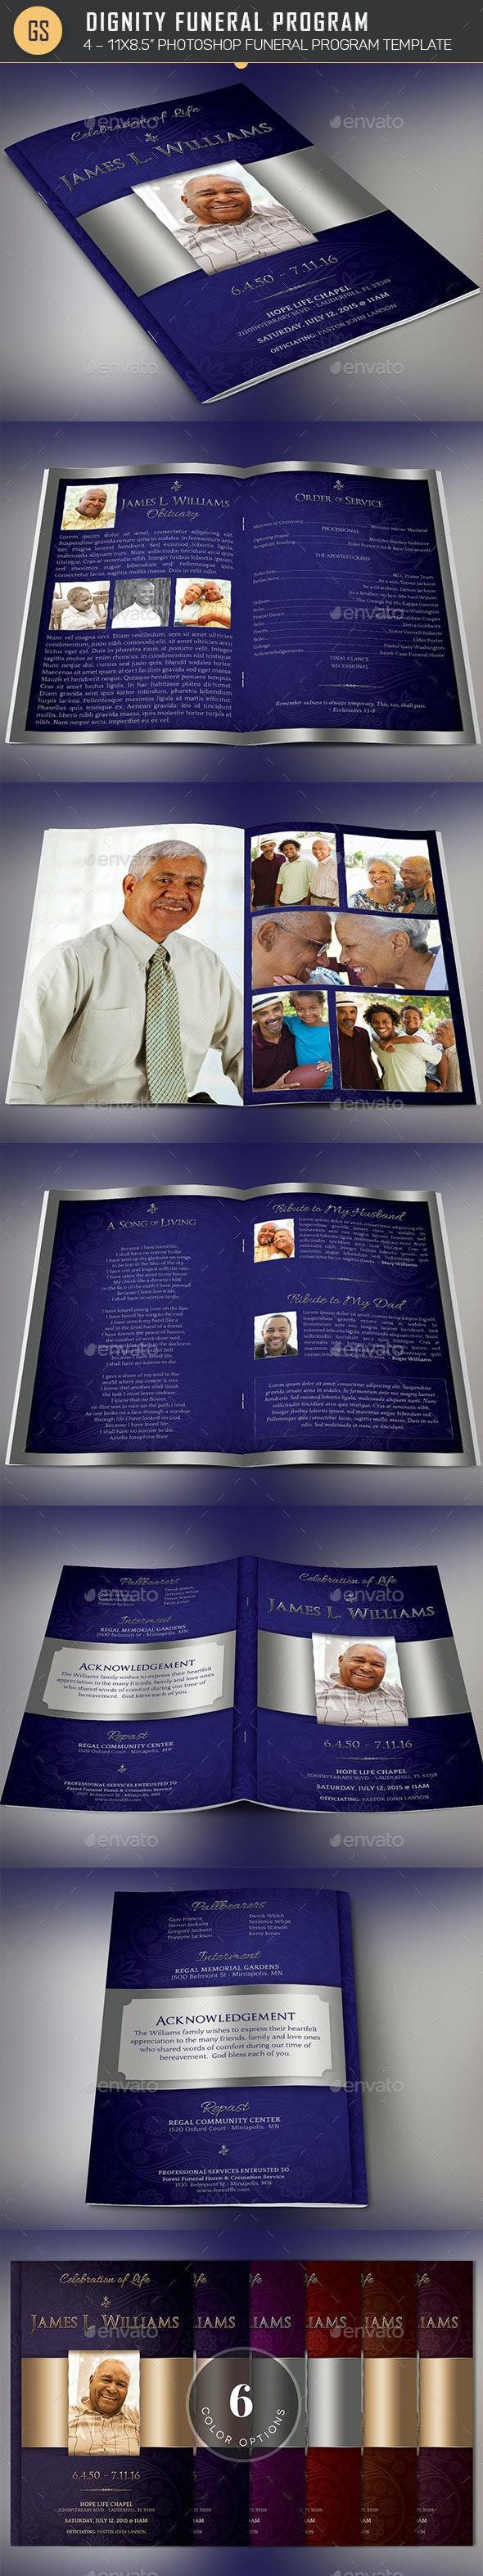 Dignity Funeral Program Photoshop Template - Informational Brochures